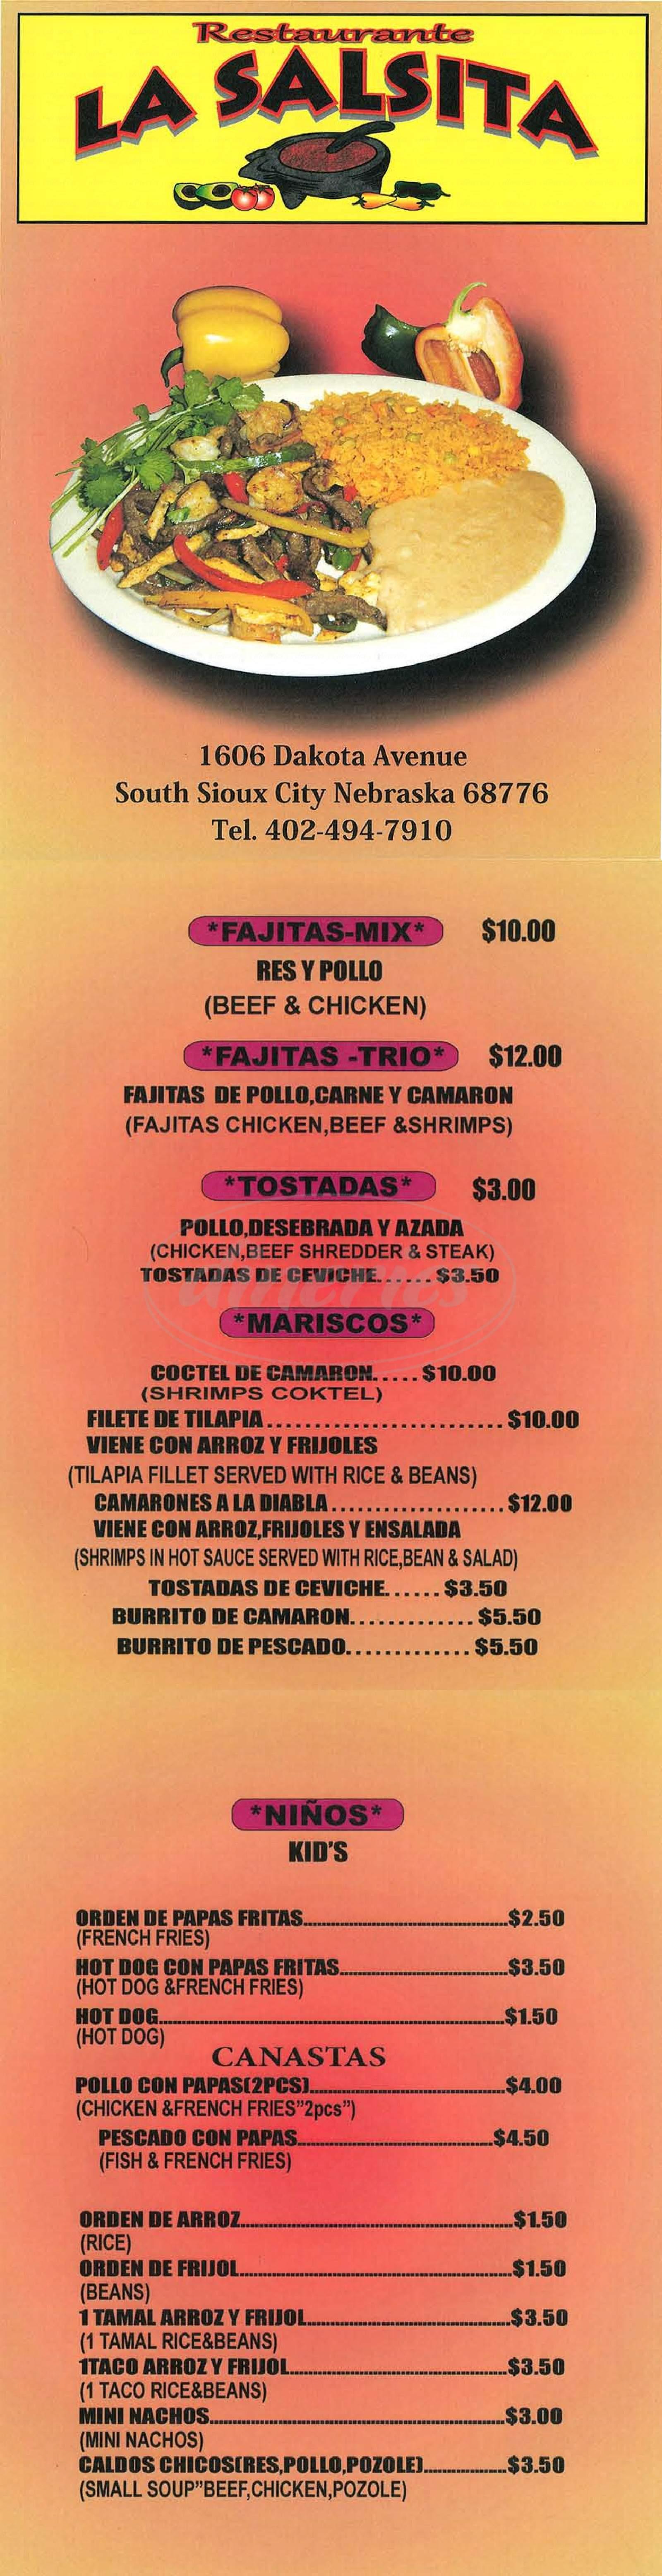 menu for La Salsita